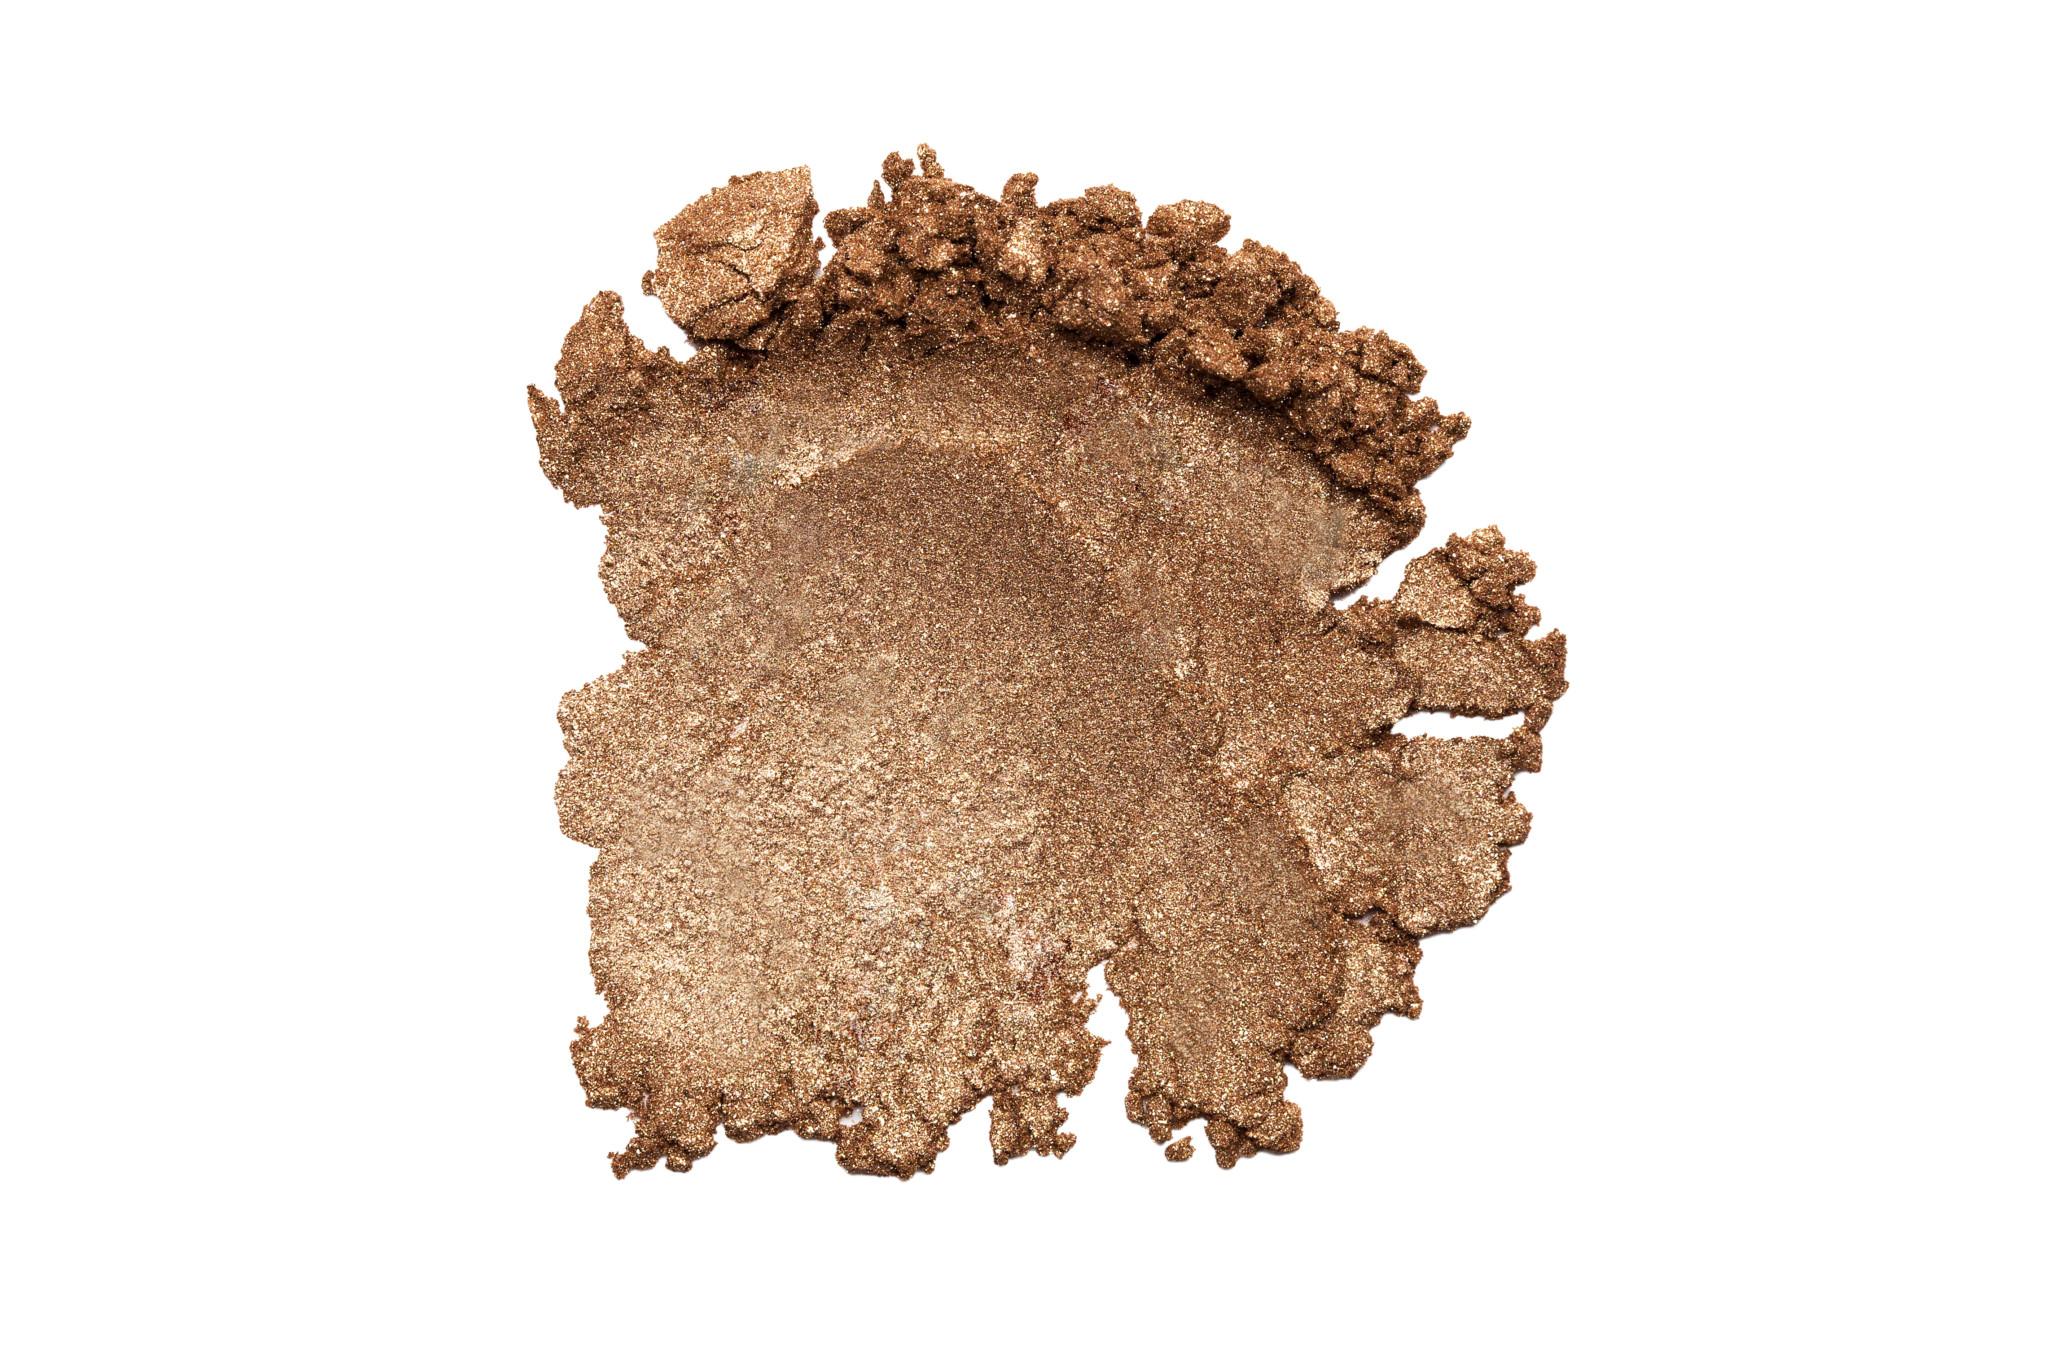 Brown-Sugar-Luminous-Shimmer-Eyeshadow-Swatch-Alima-Pure